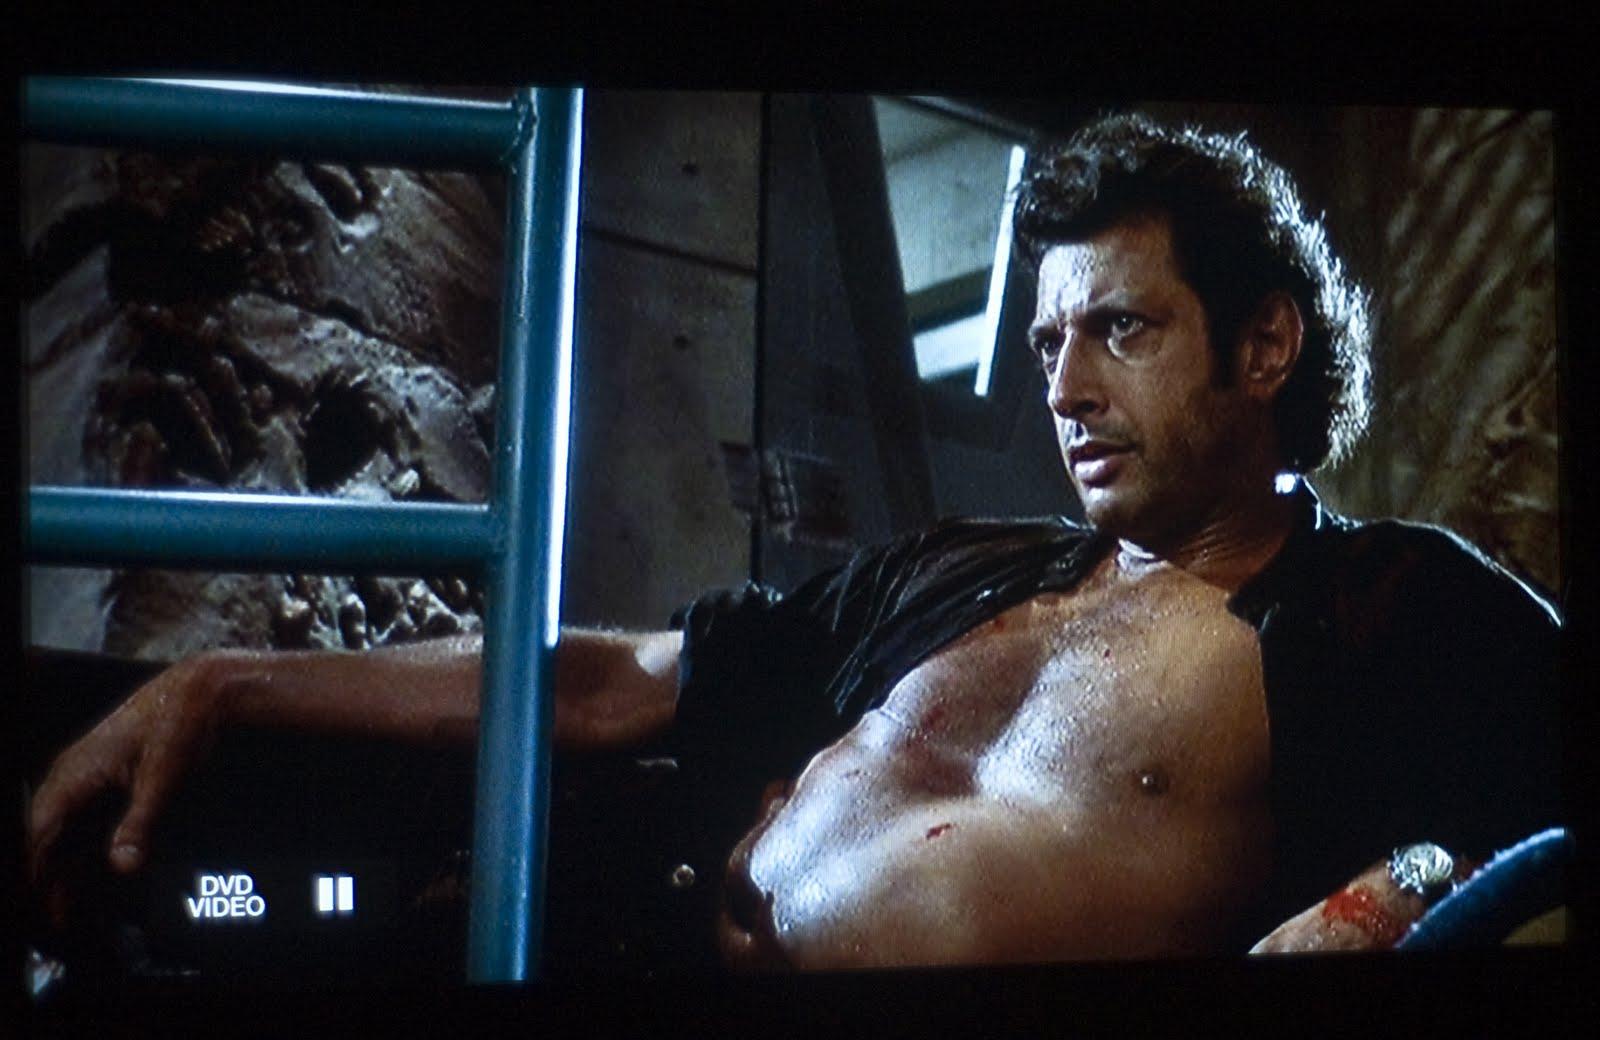 'Jurassic Park 3D' Trailer: When Dinosaurs Ruled the Earth ...